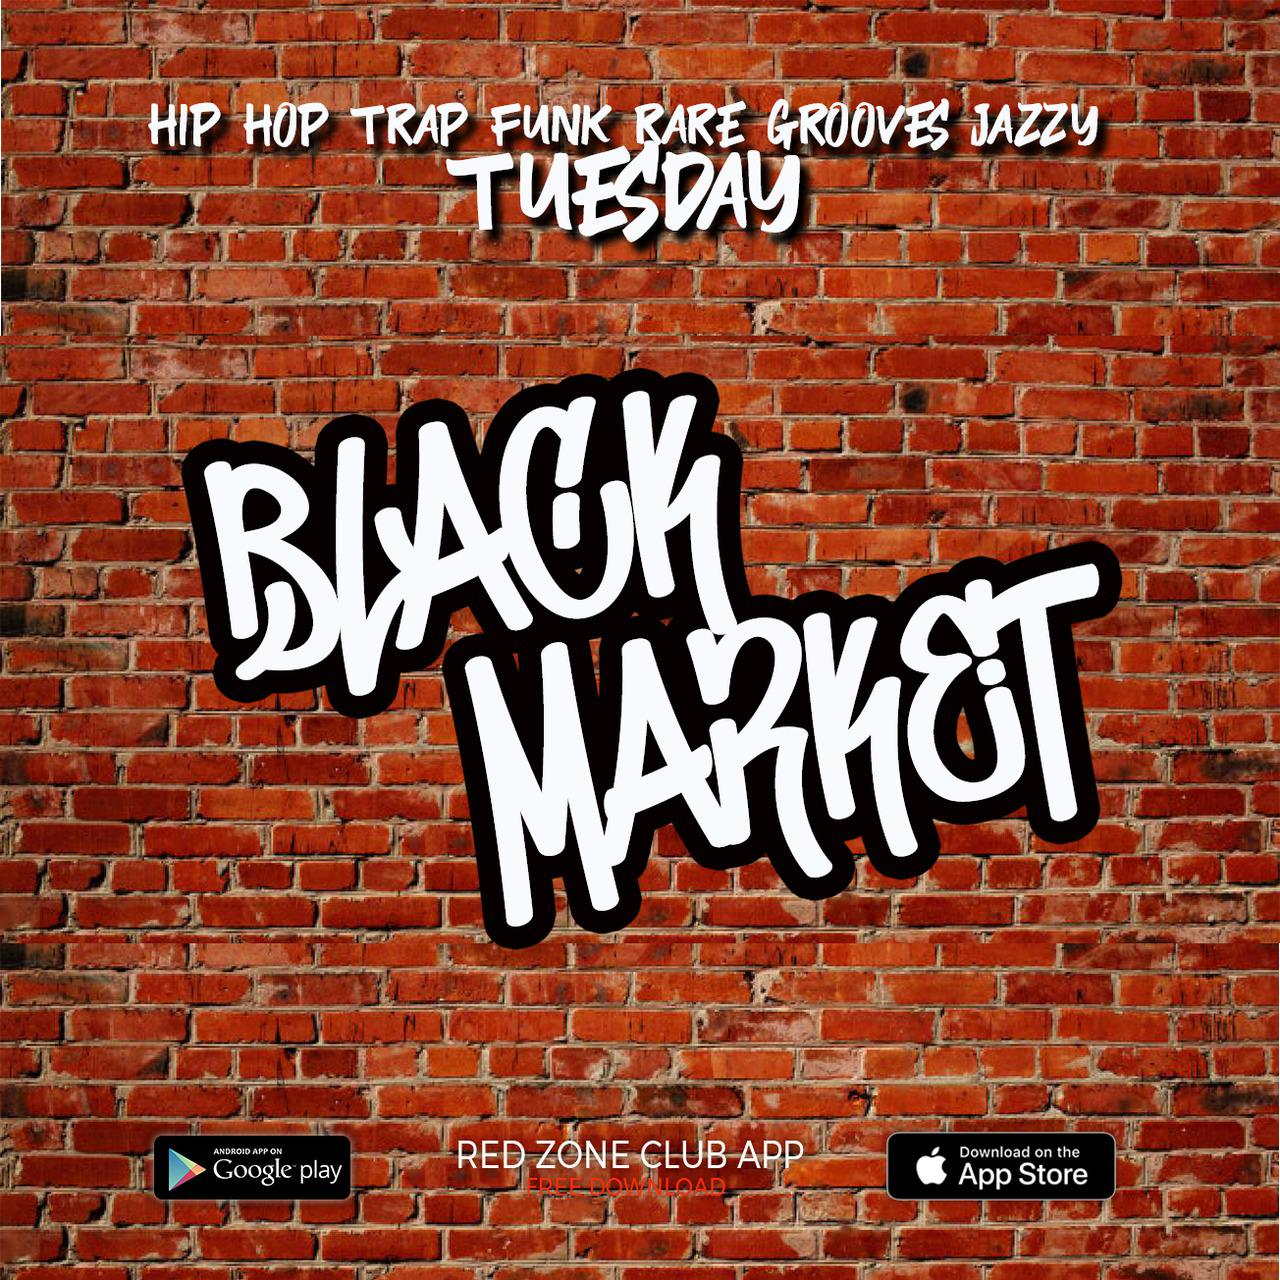 tuesday black market